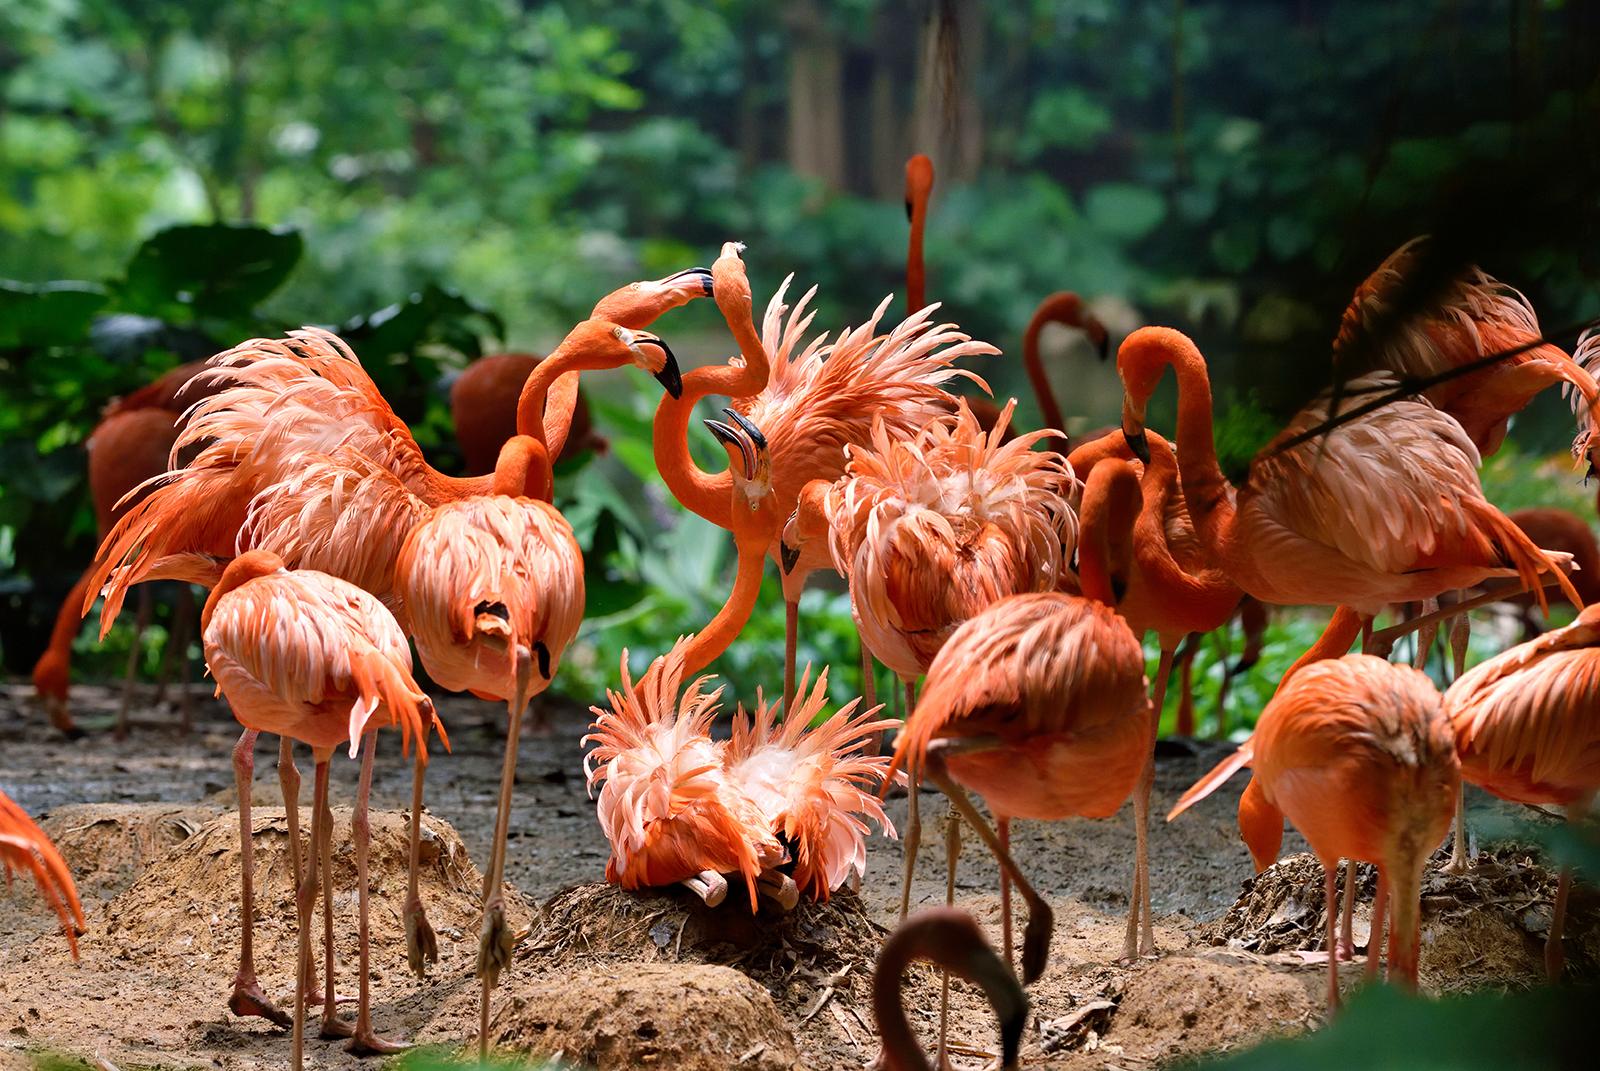 15% Off | Guangzhou Chimelong Safari Park Ticket